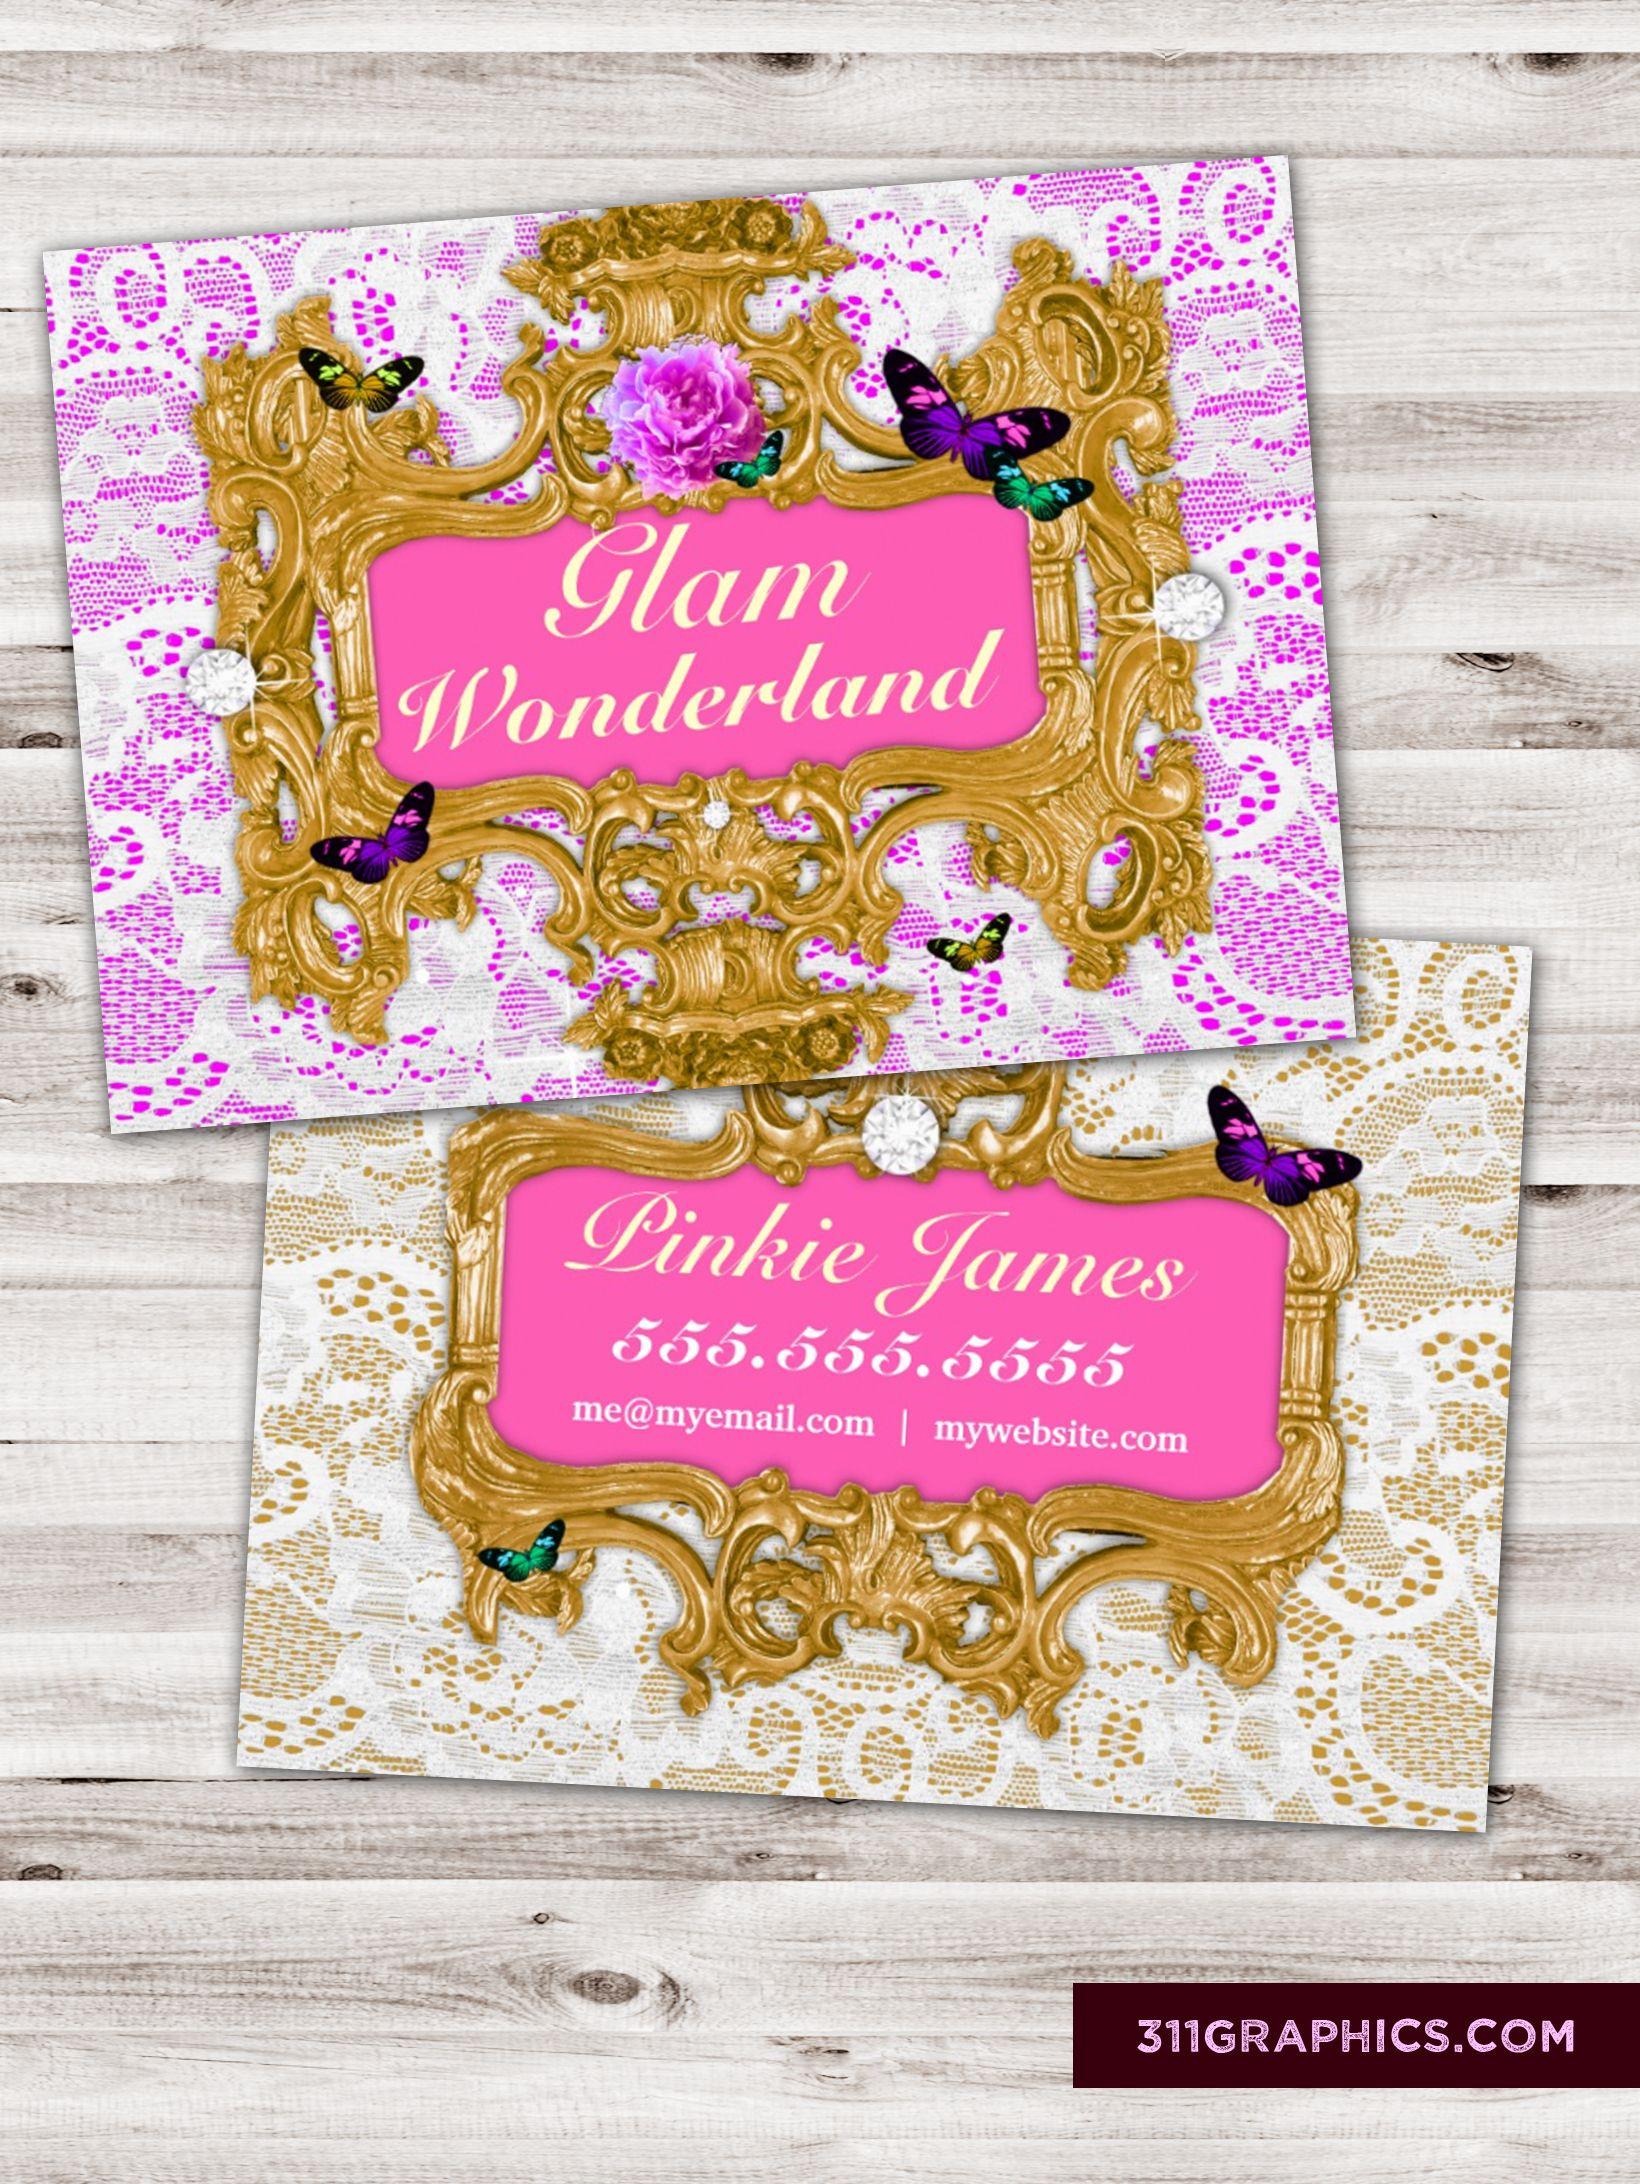 lace business cards funky junker trashers butterflies gold